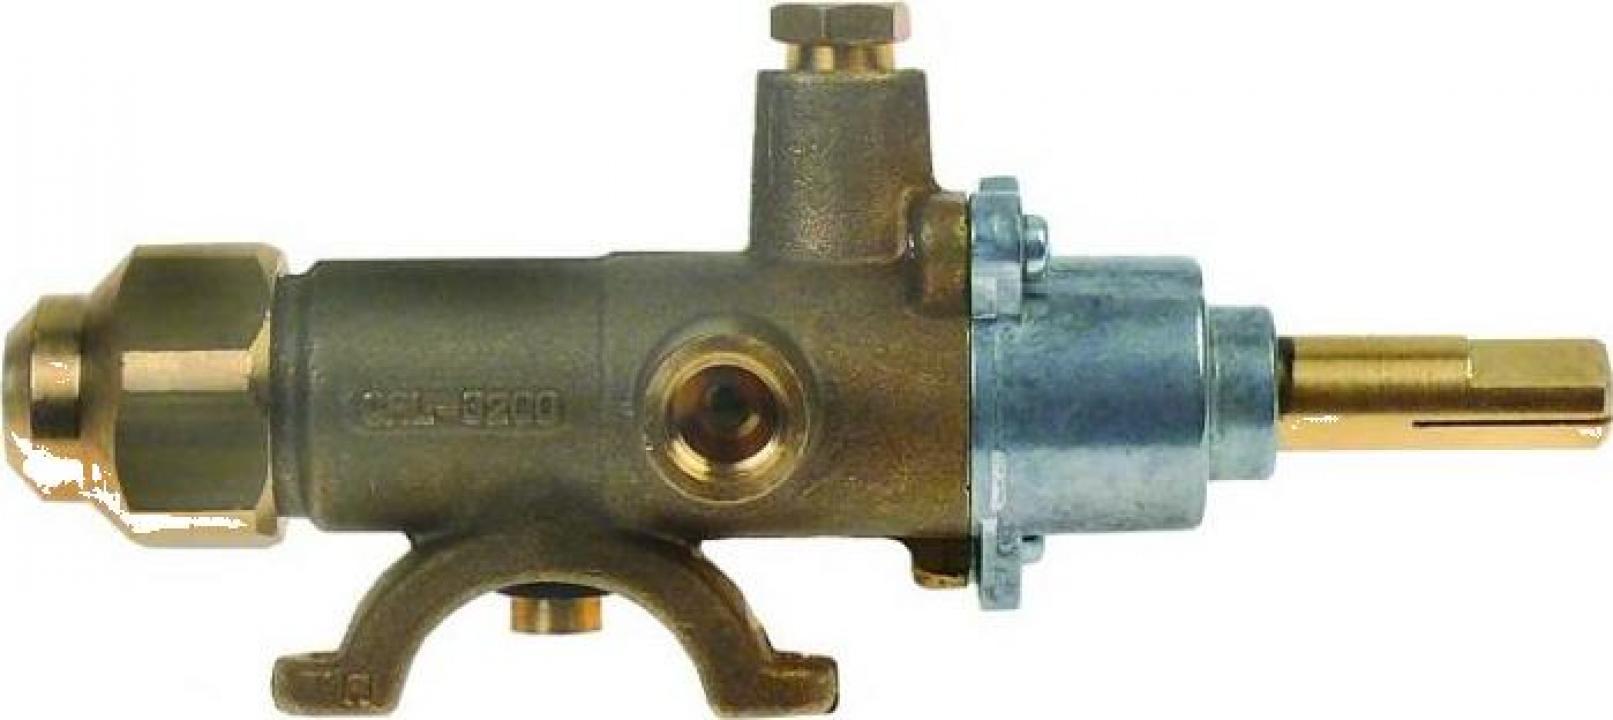 Robinet de gaz Copreci CPMM-18700